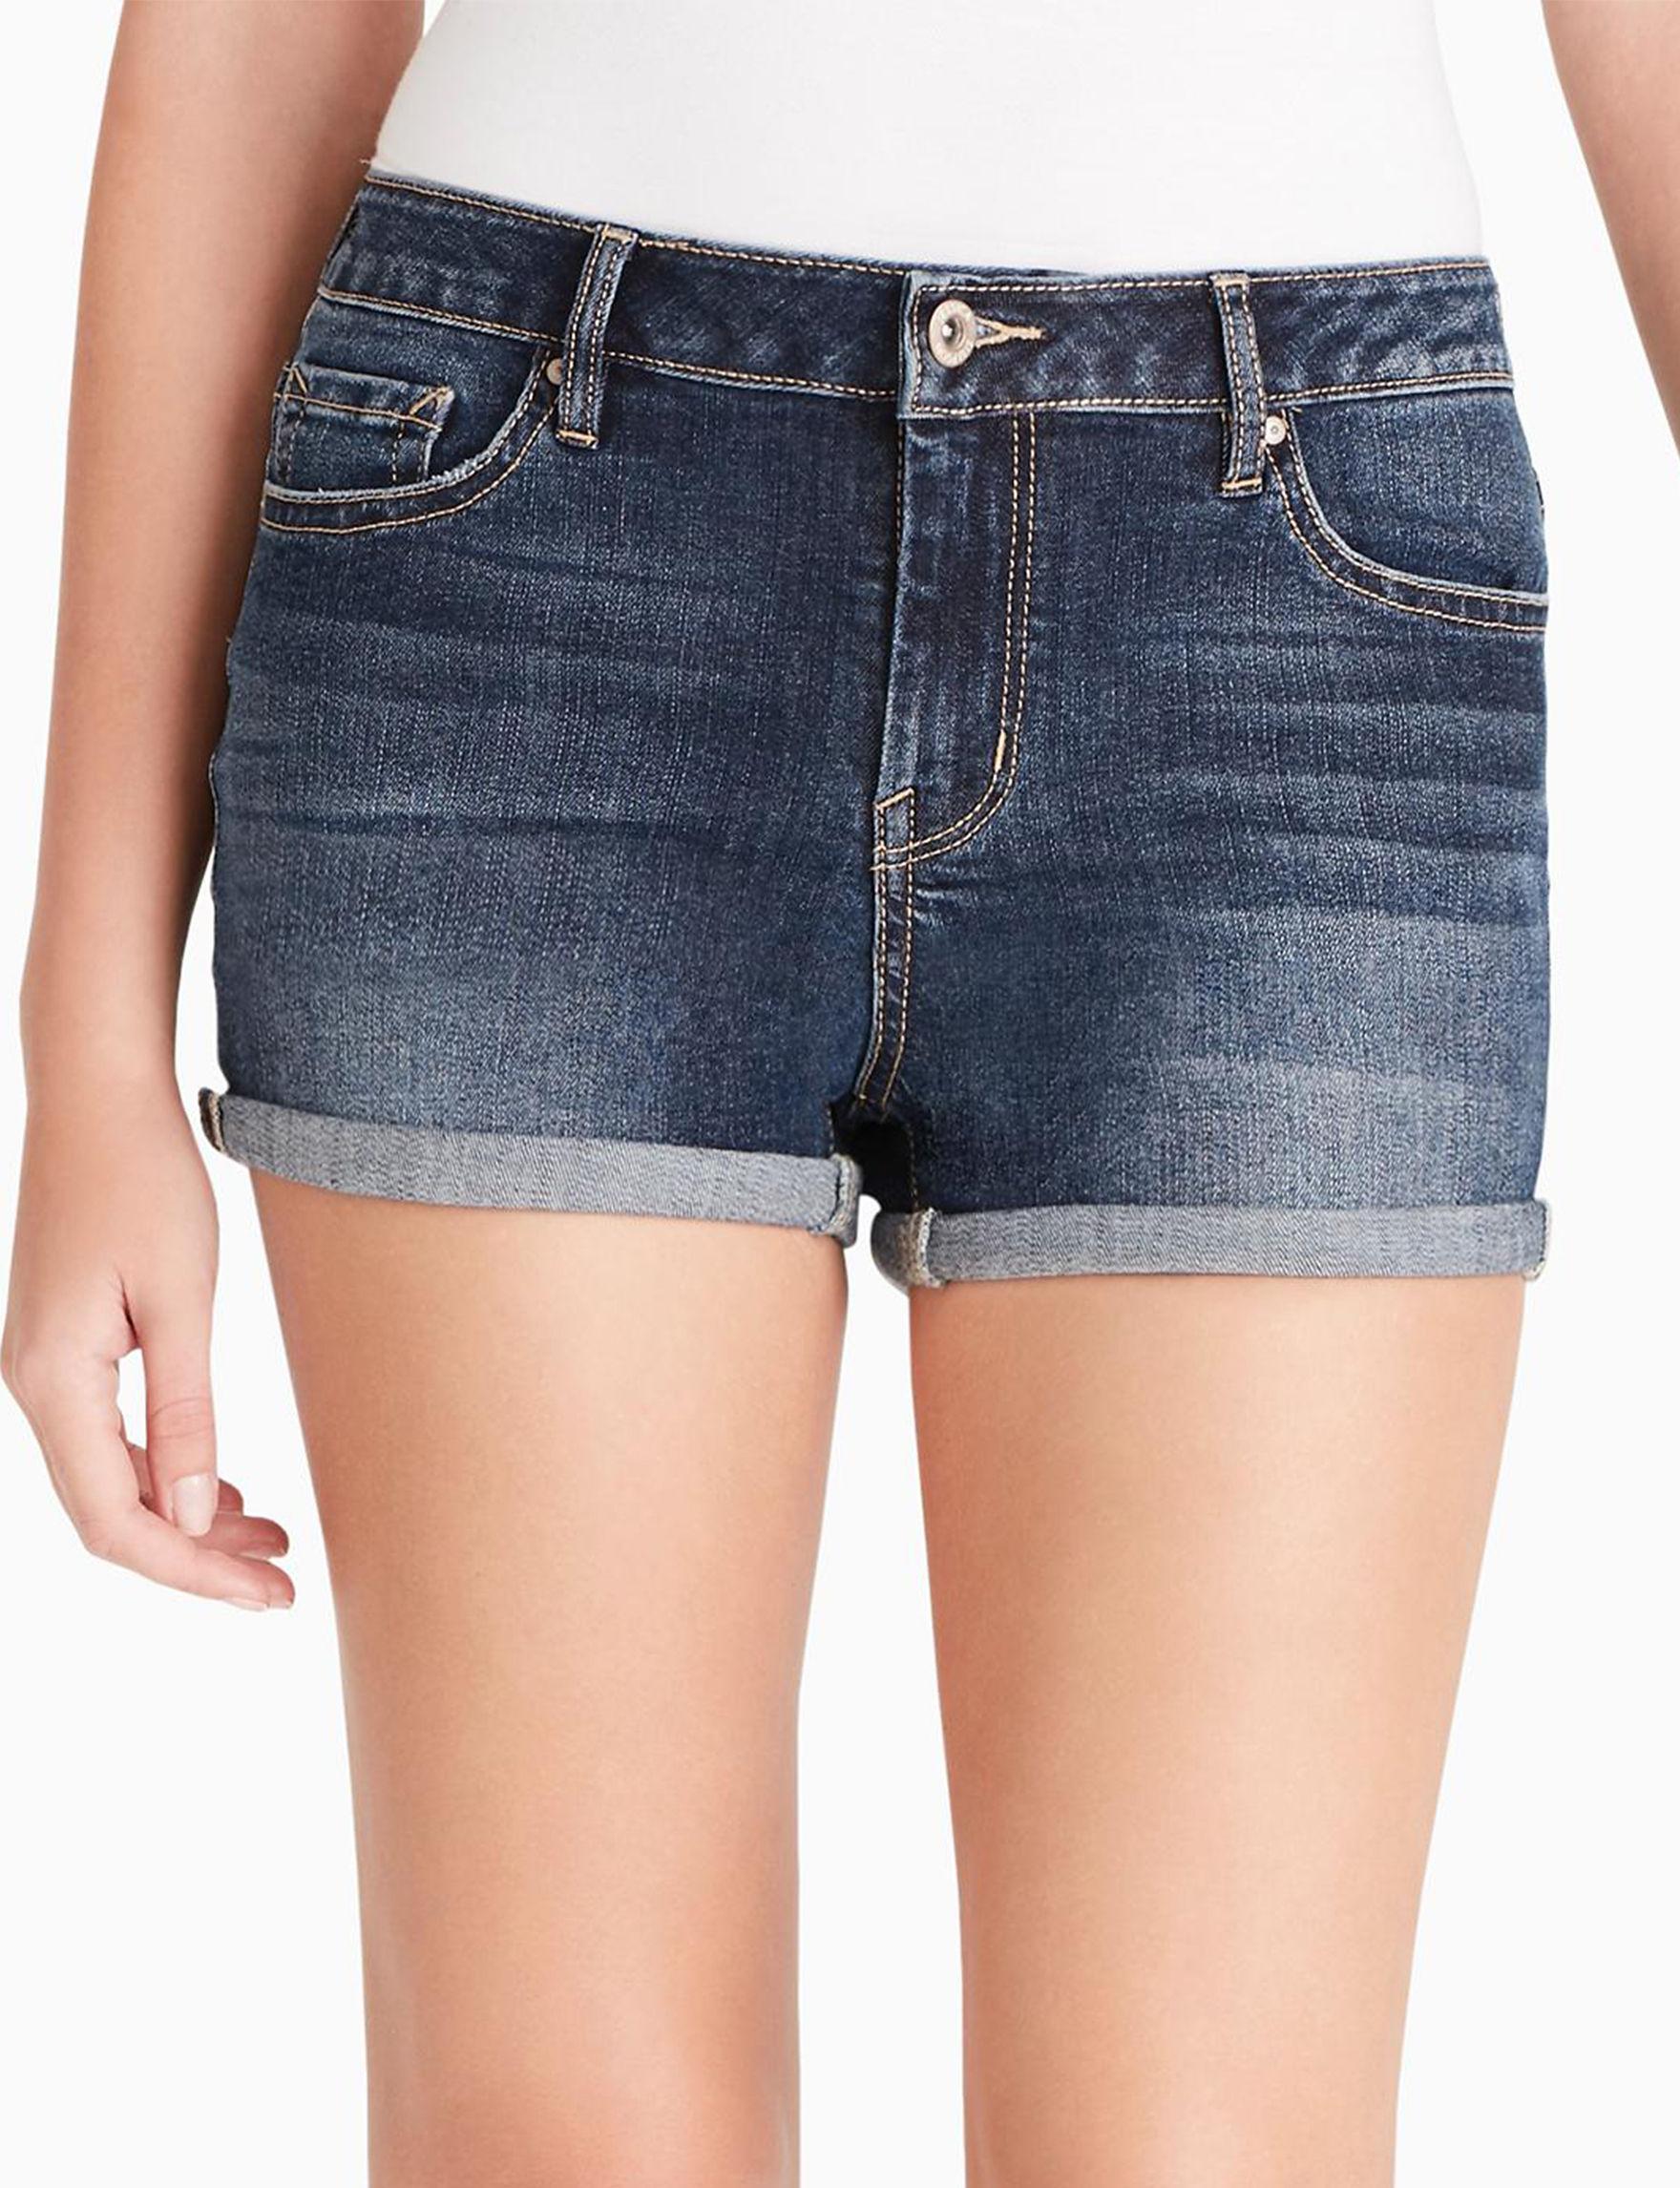 Jessica Simpson Dark Blue Denim Shorts